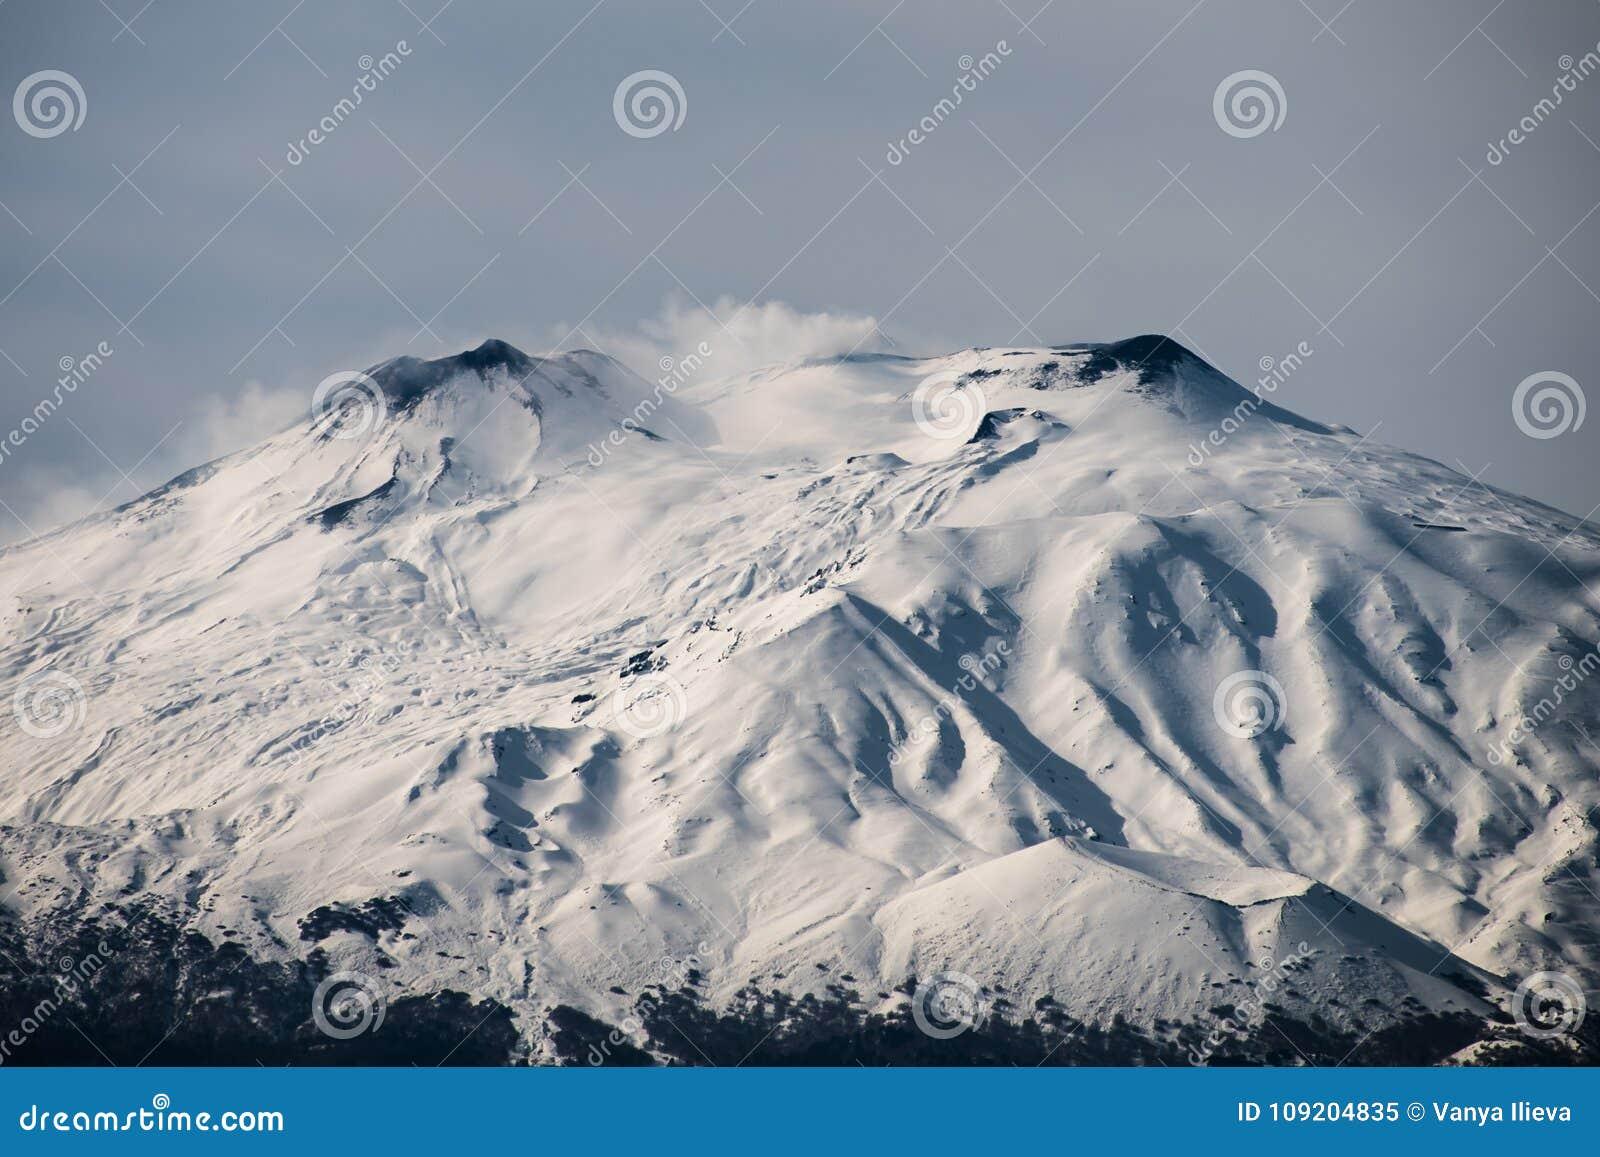 Snow at Mount Etna, Sicily